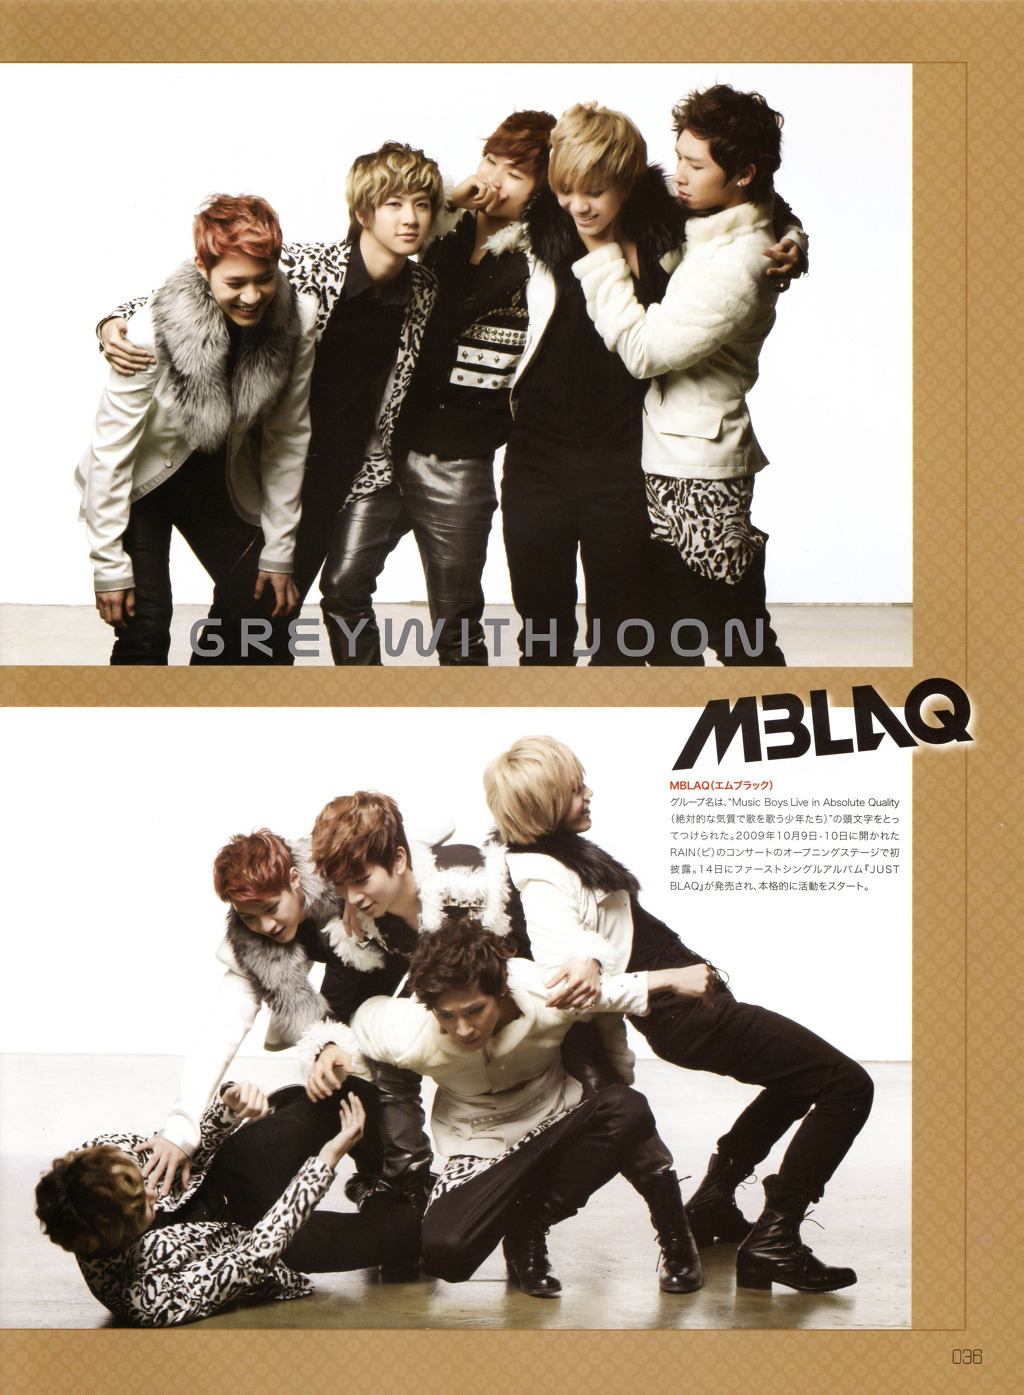 [01.03.11]MBLAQ @ CREA STAR Scan15